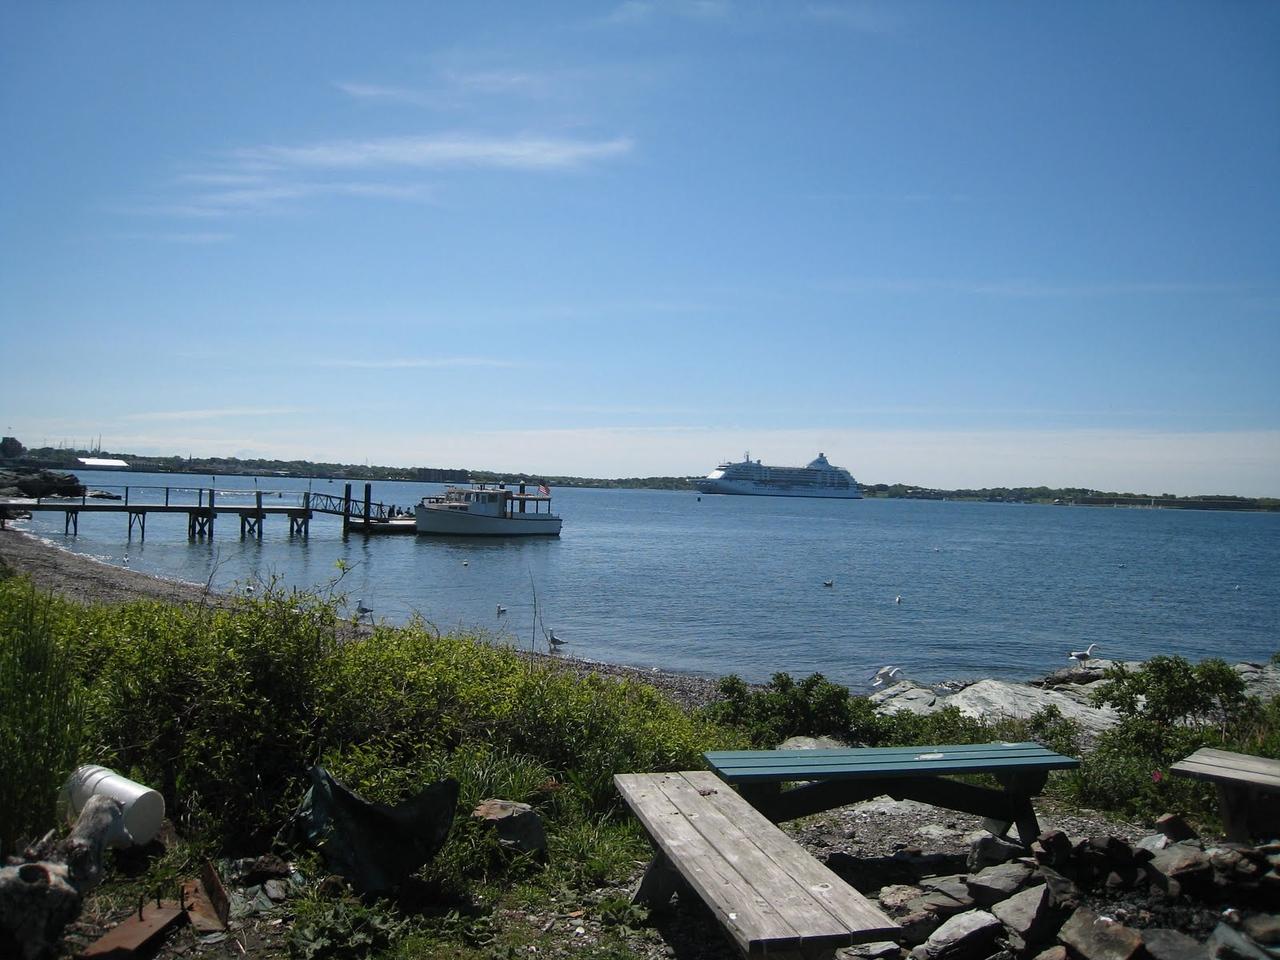 View from Rose Island, Newport, Rhode Island